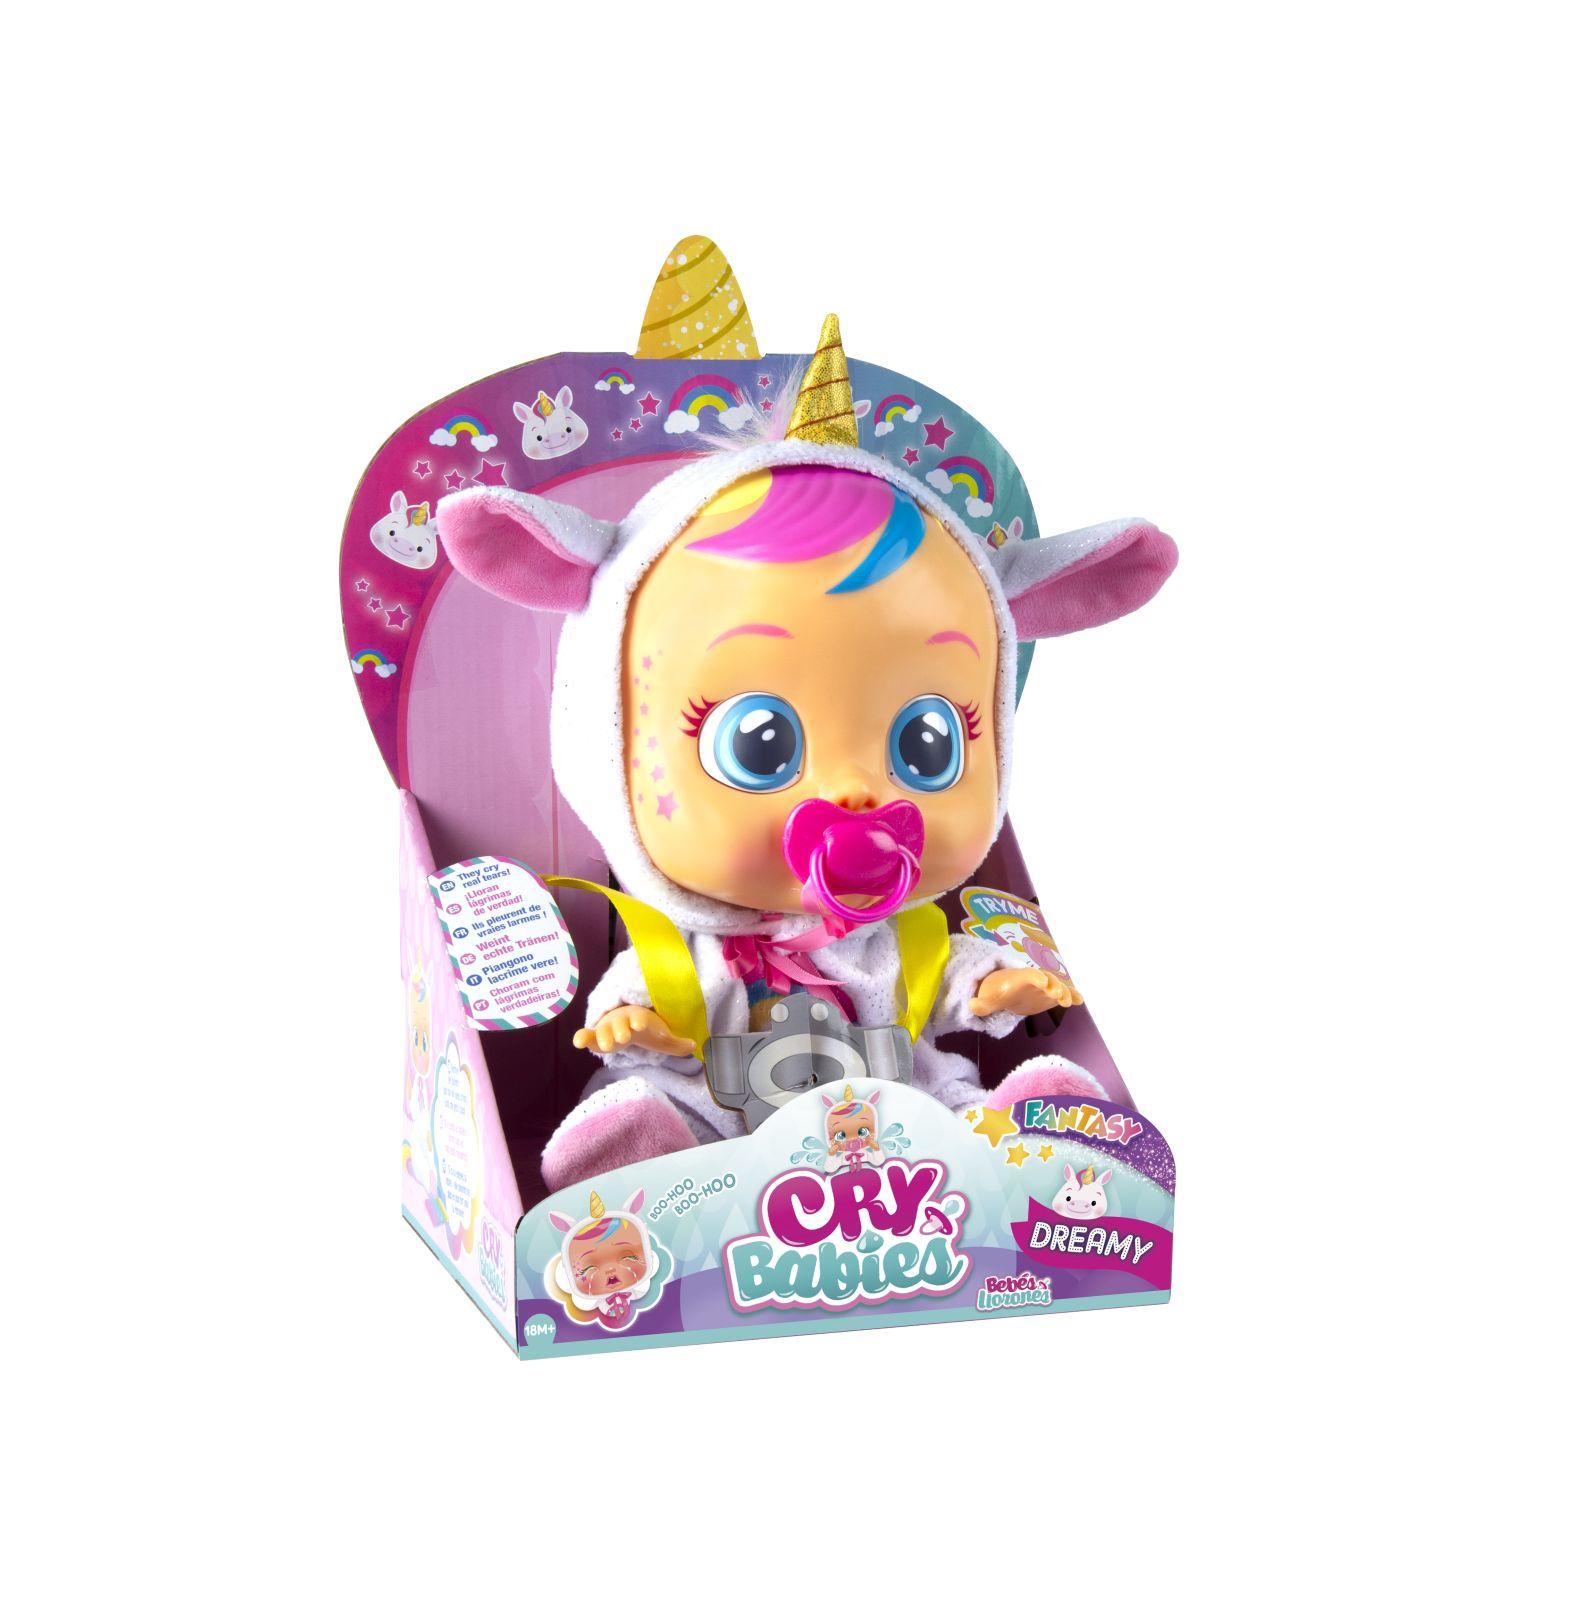 Cry babies fantasy dreamy -